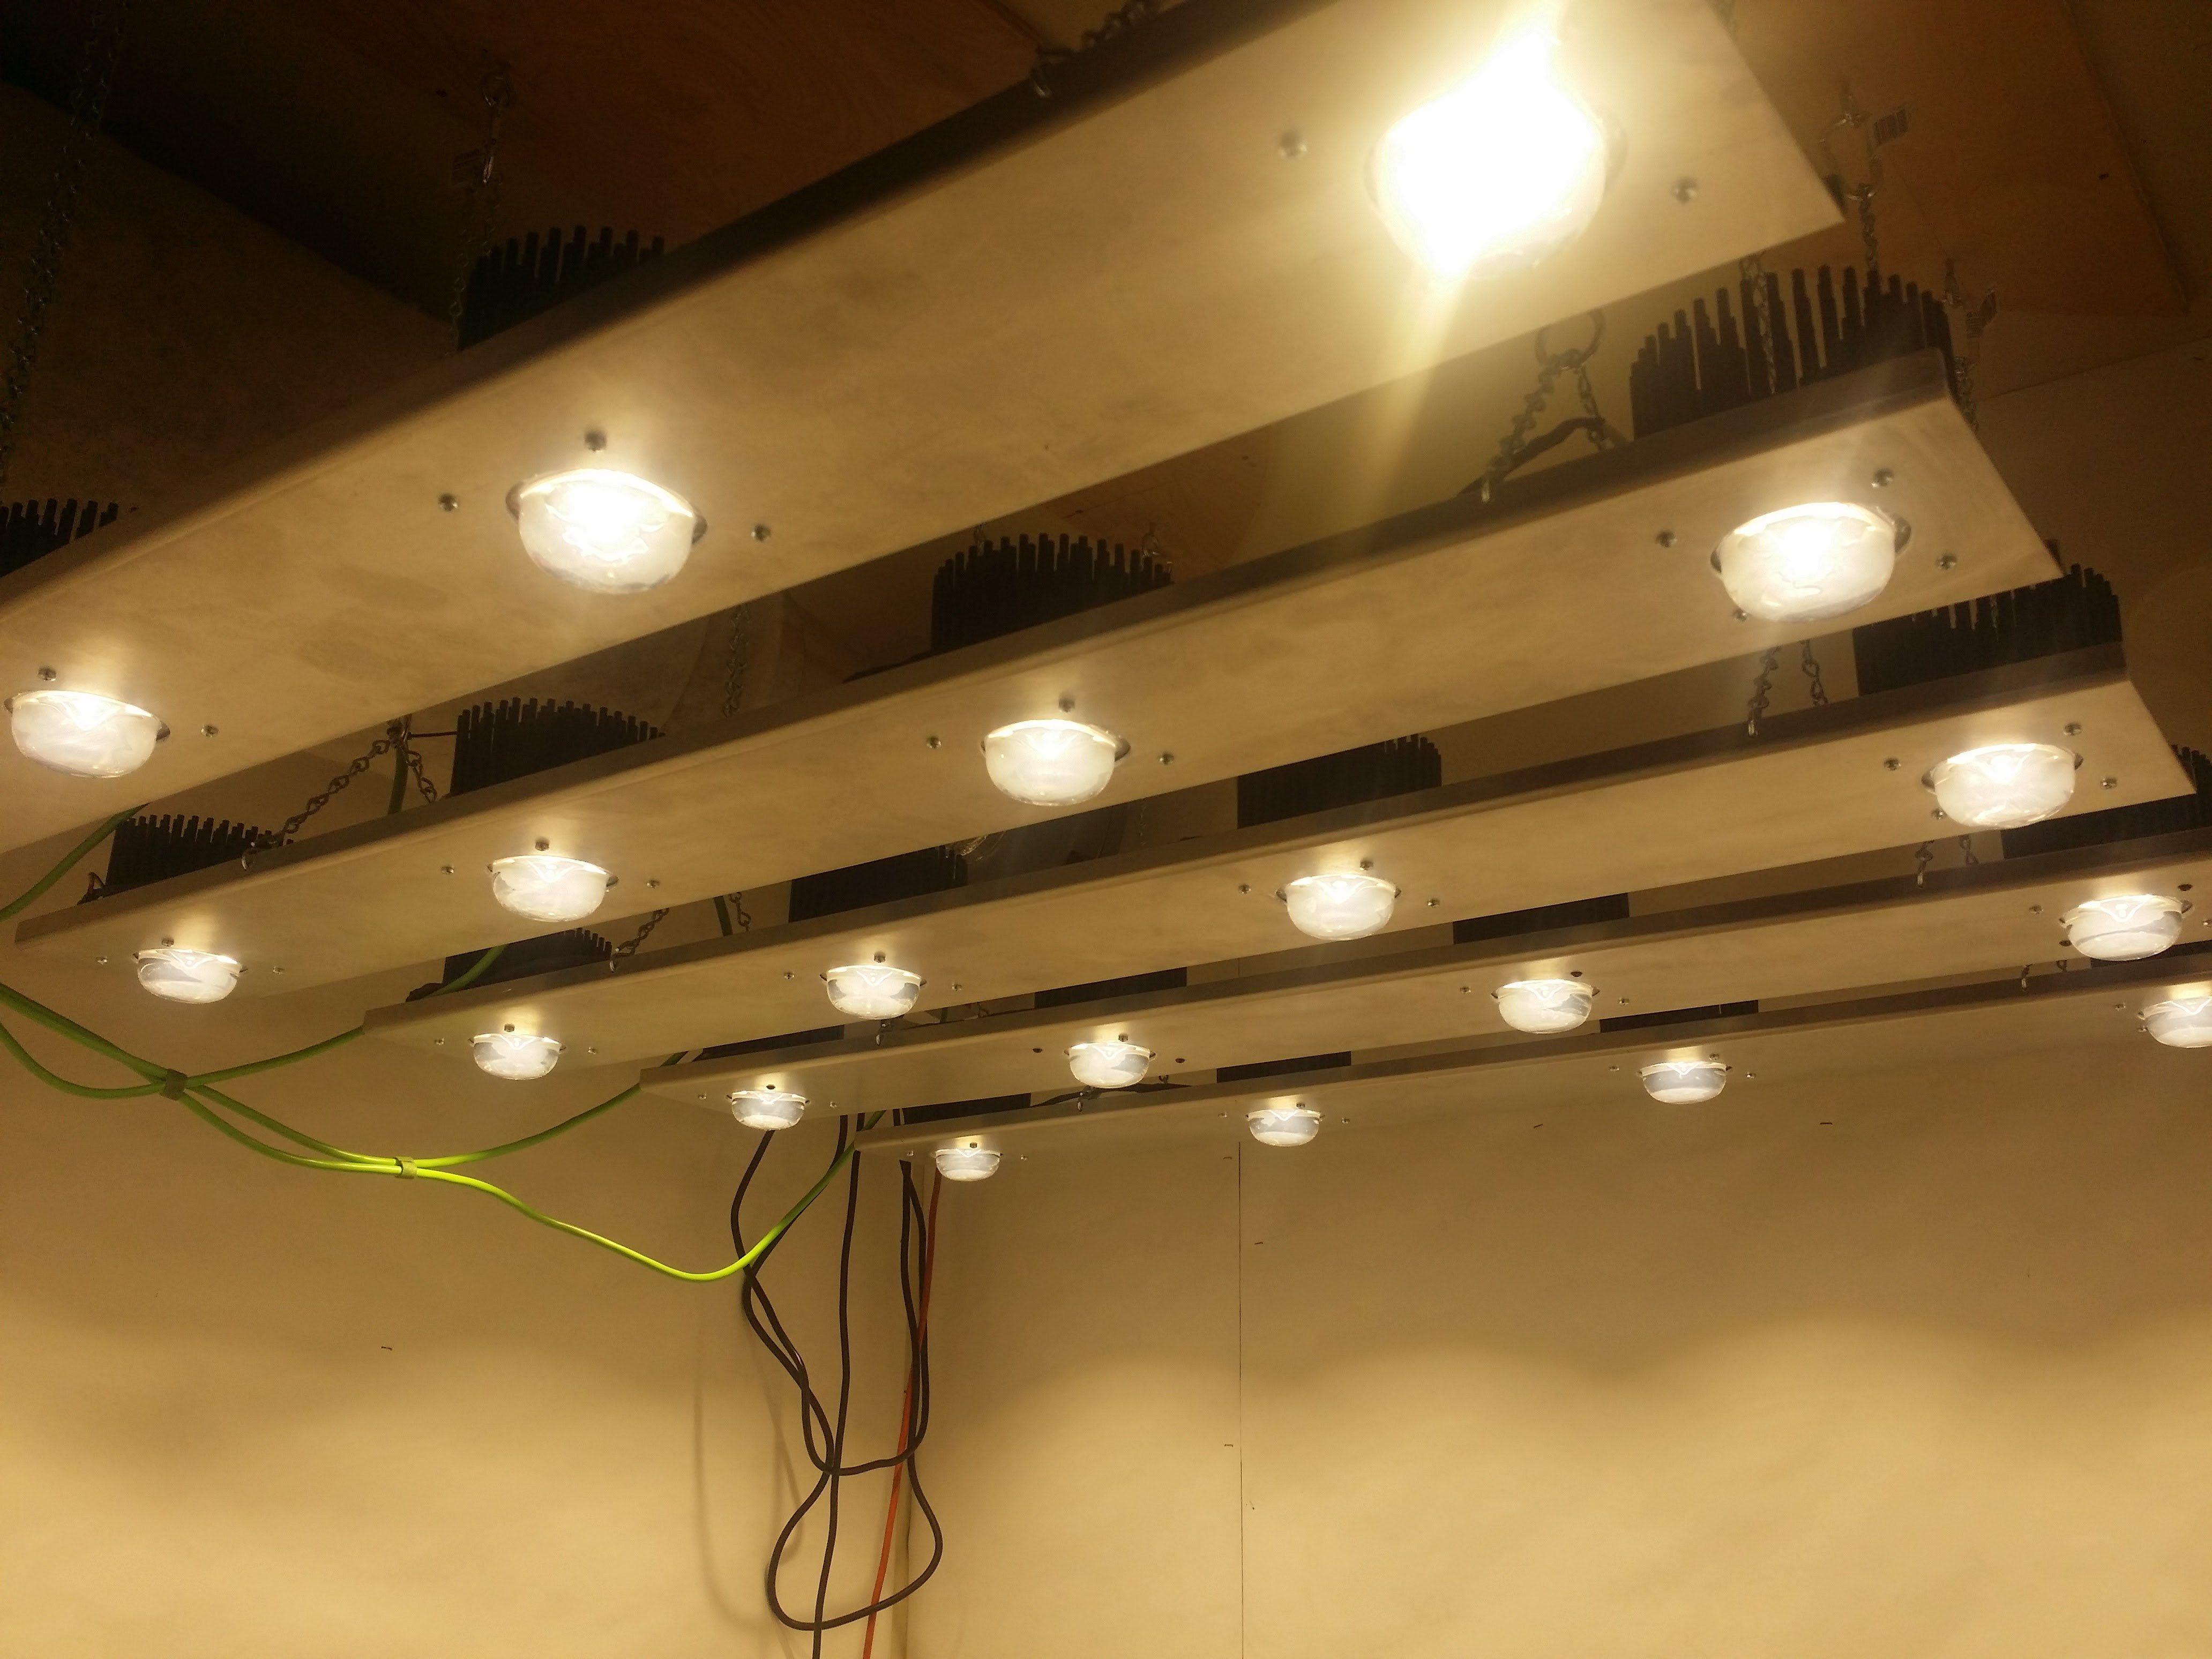 lighting light bulb grow lights de yield bulbs hps ballasts box ended double lab